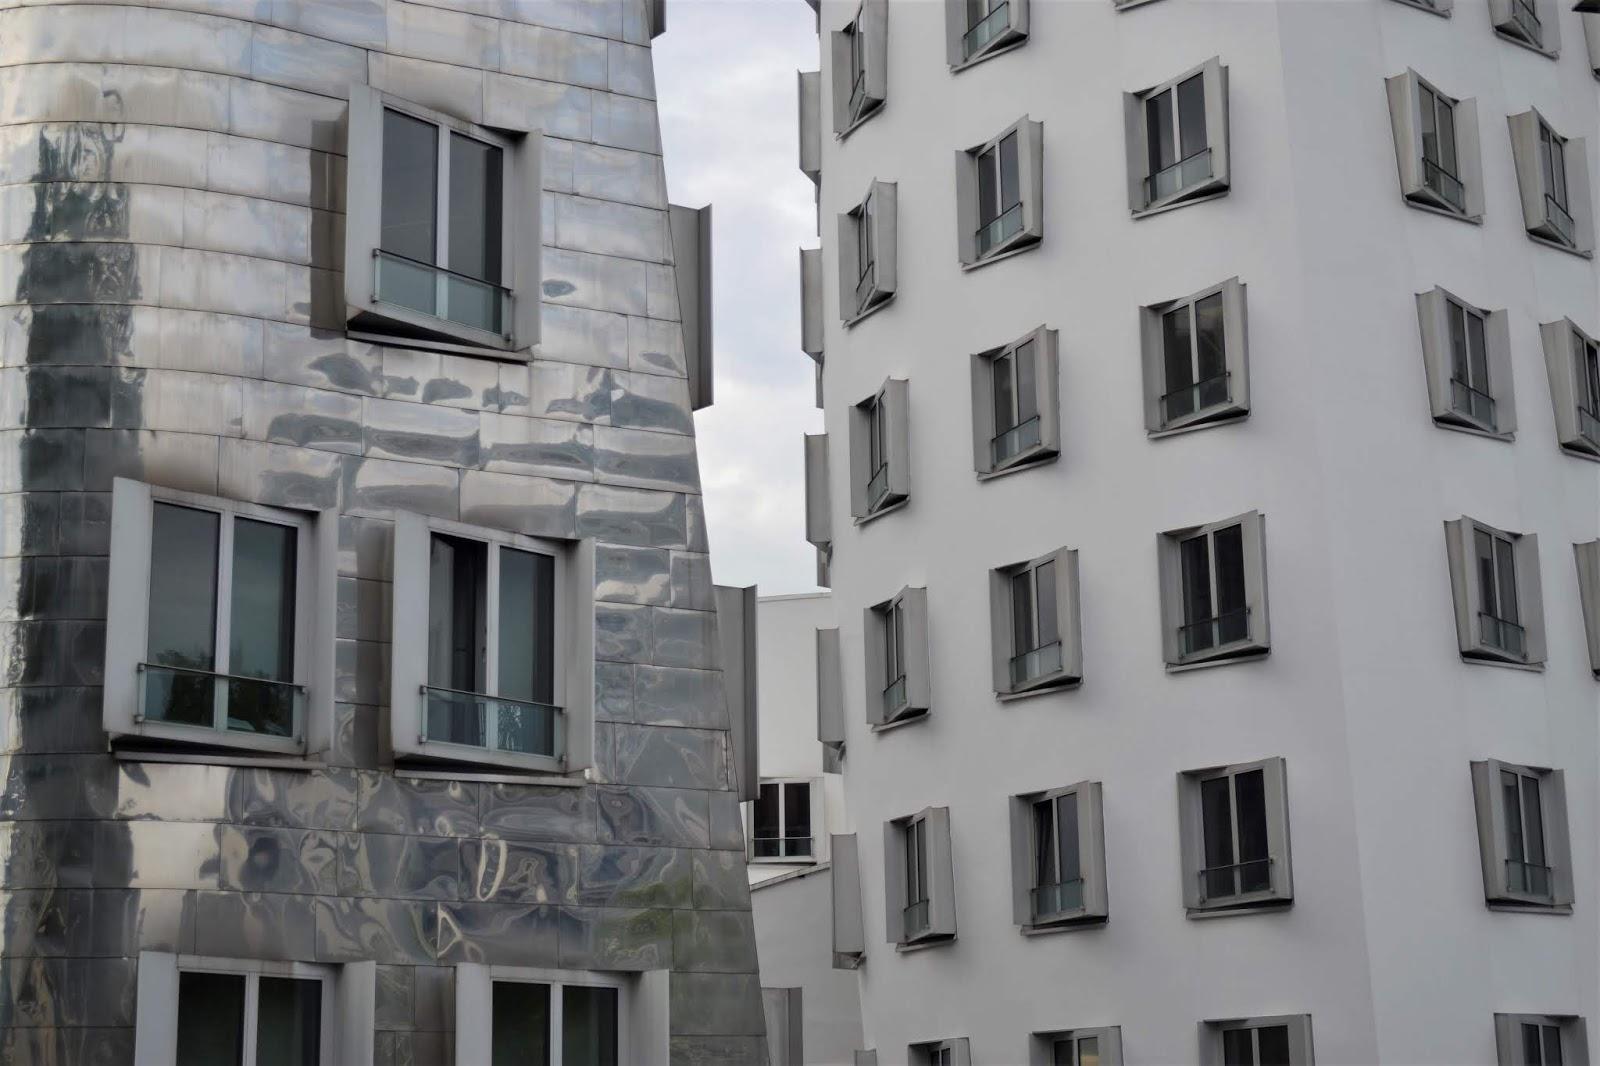 Architettura decostruttivista